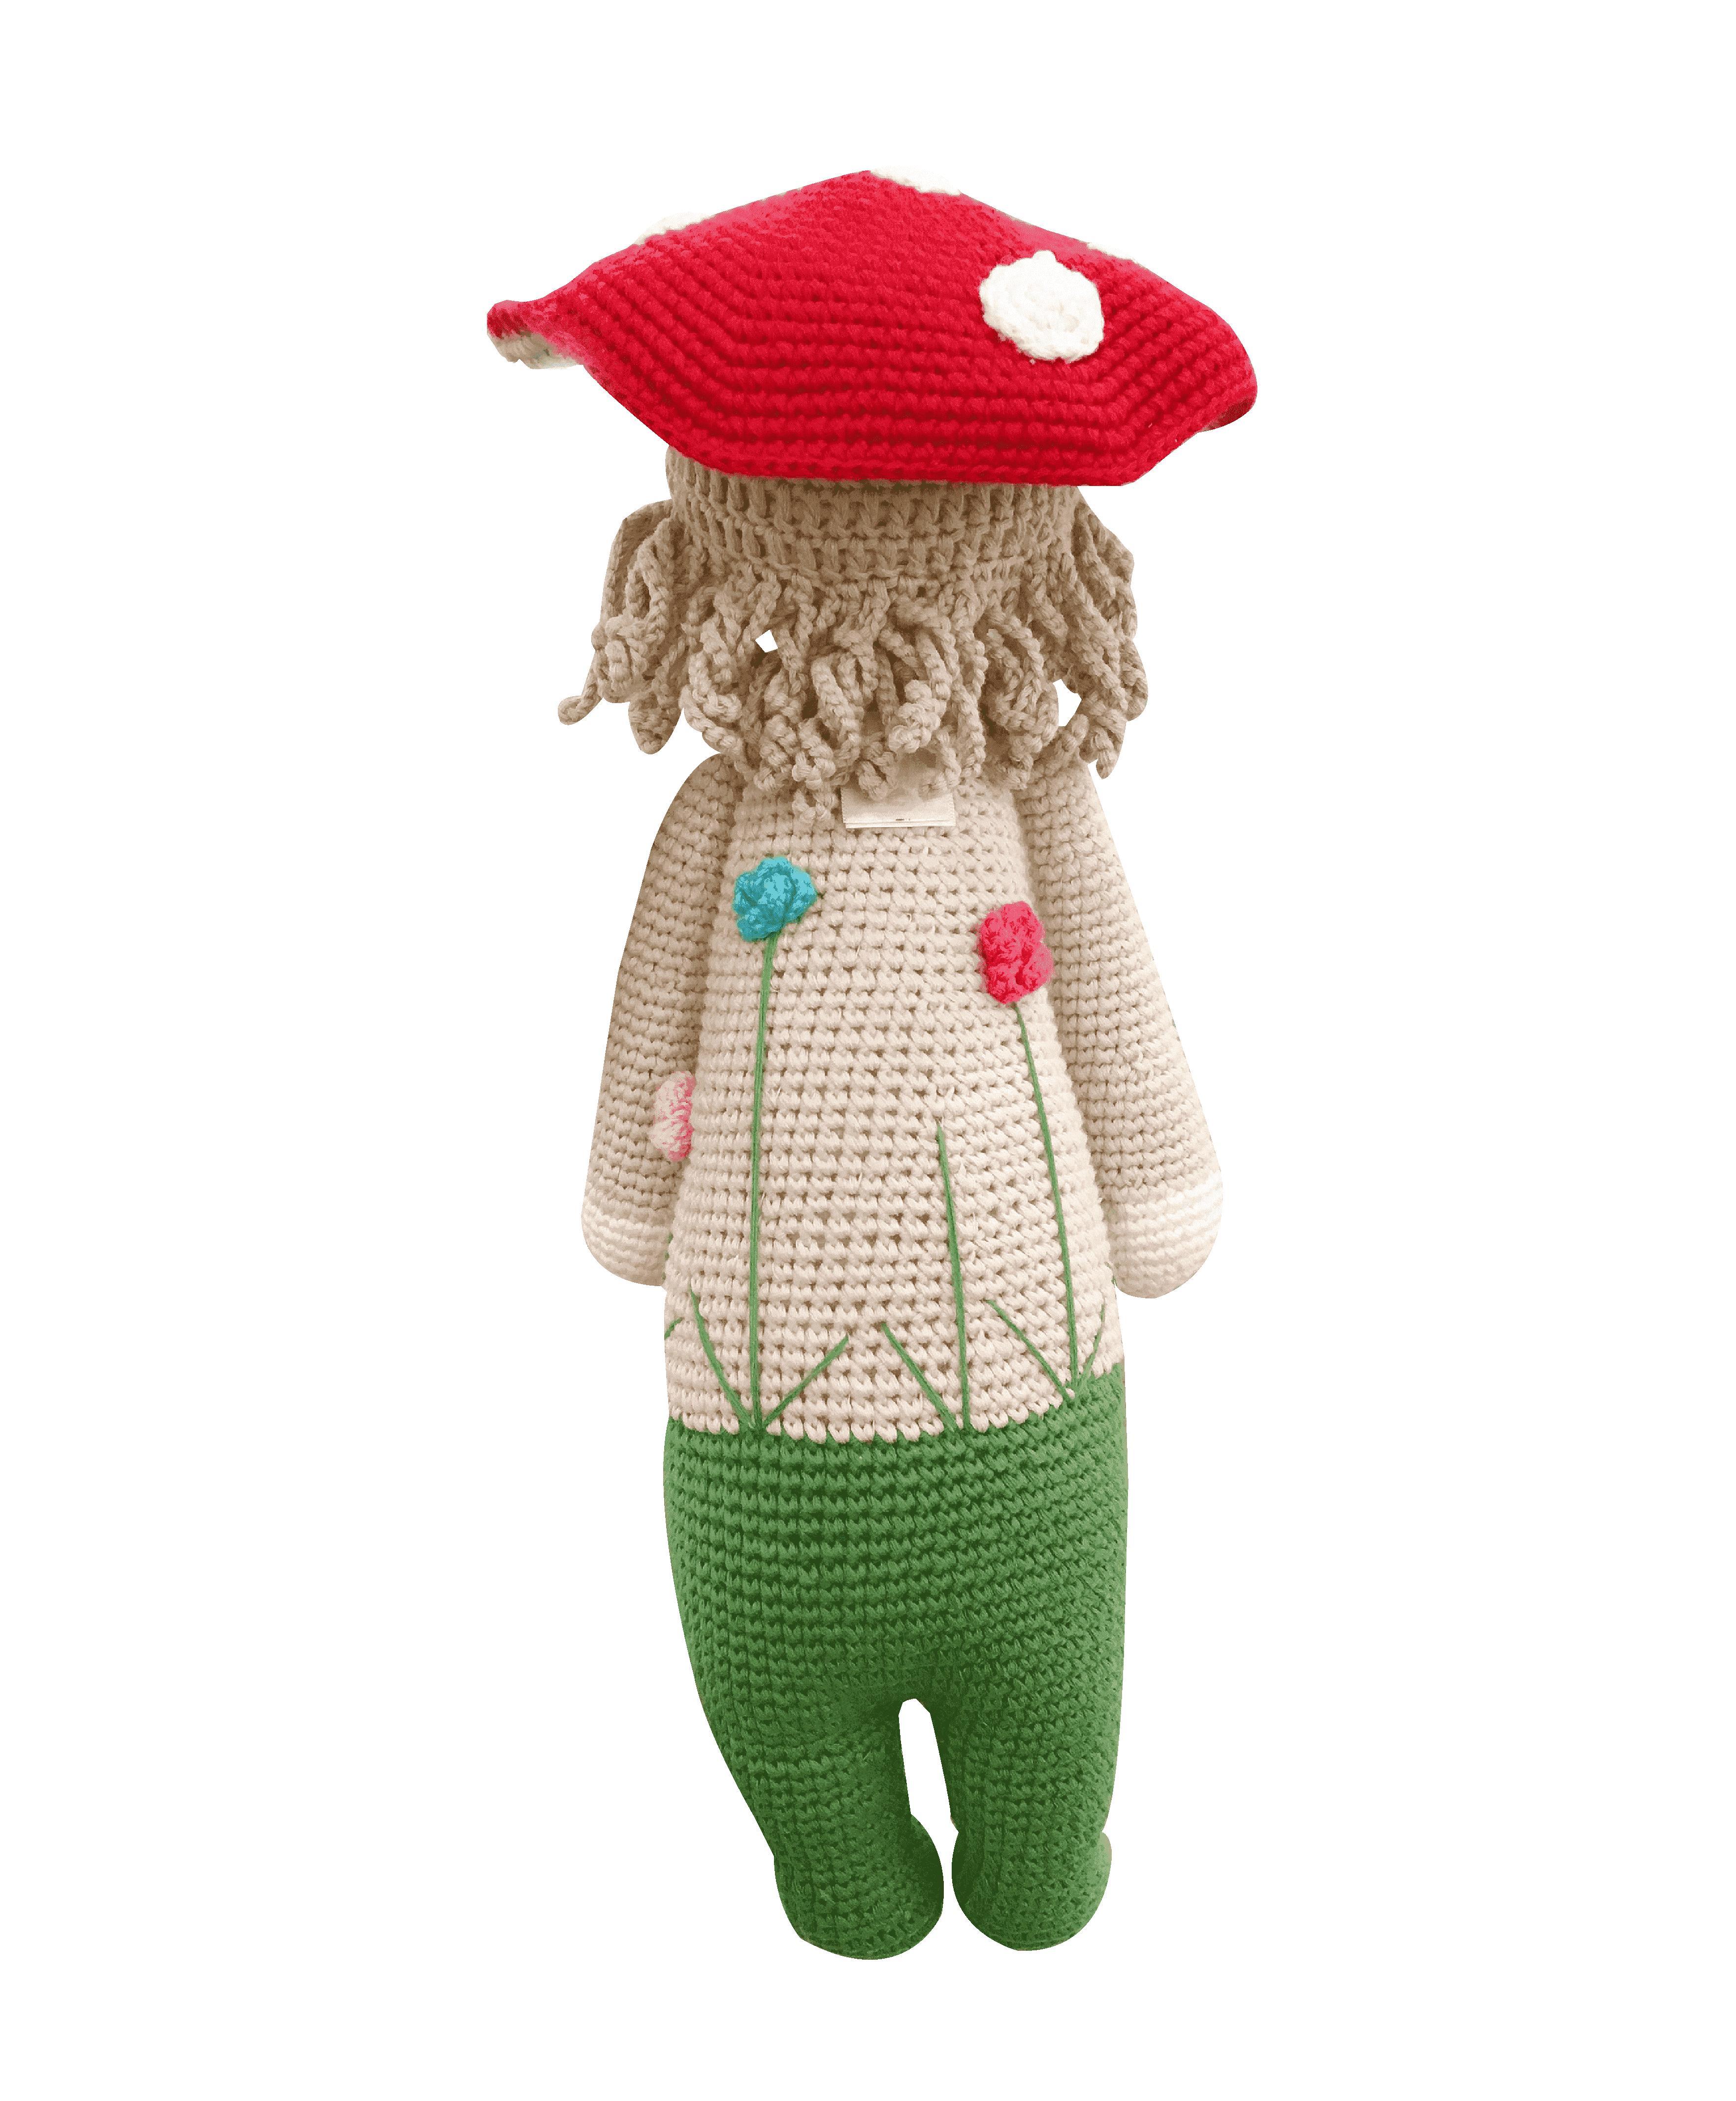 MiMi Girl Mushroom